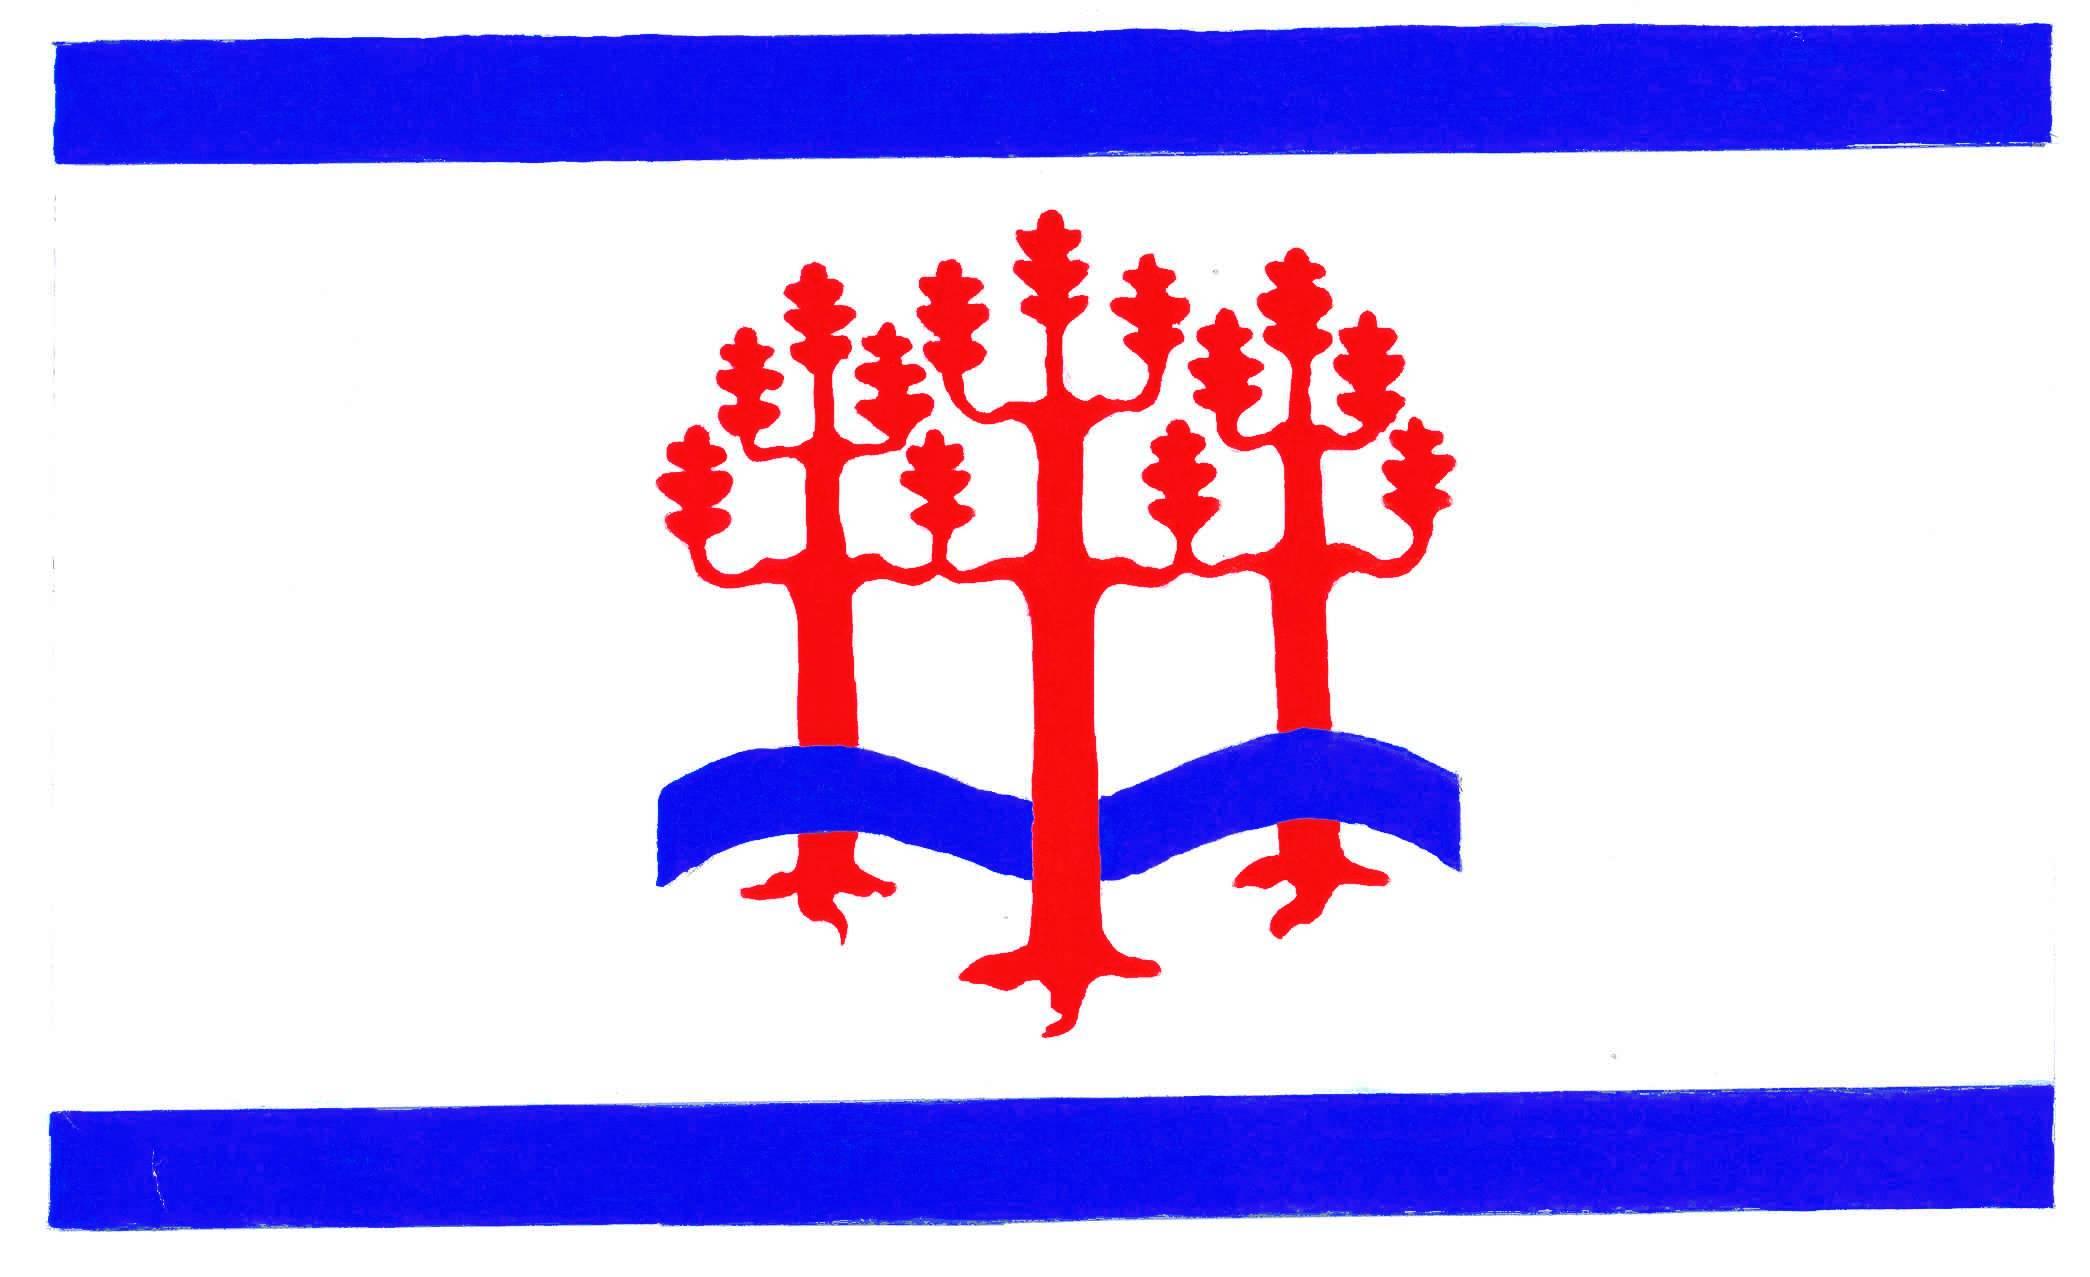 Flagge GemeindeHolzdorf, Kreis Rendsburg-Eckernförde